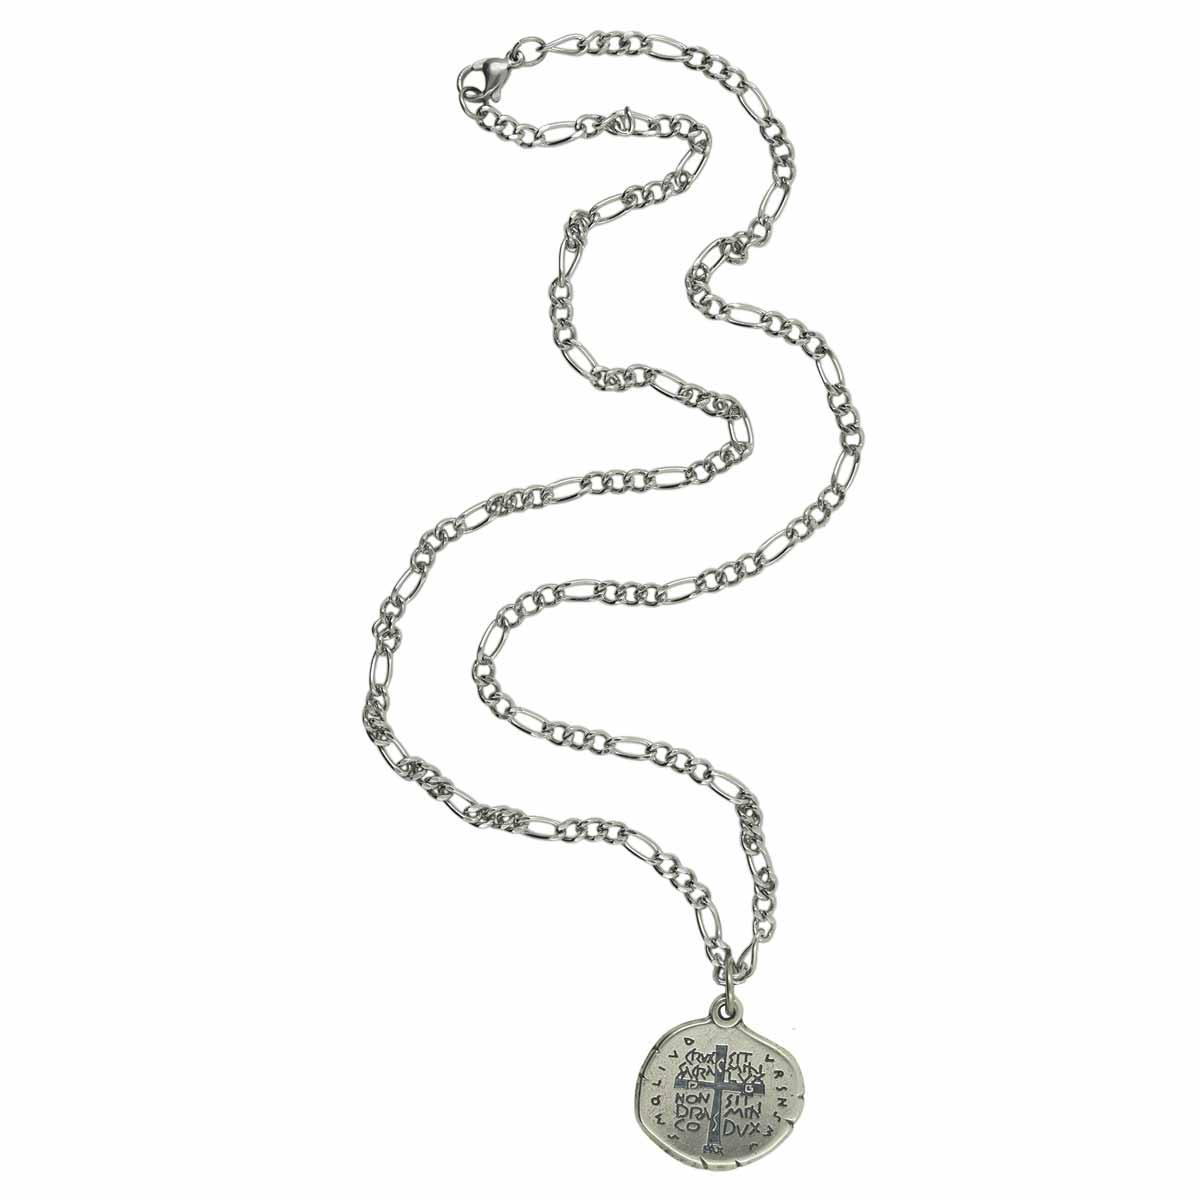 Corrente Inox Medalha das Duas Cruzes - Masculina